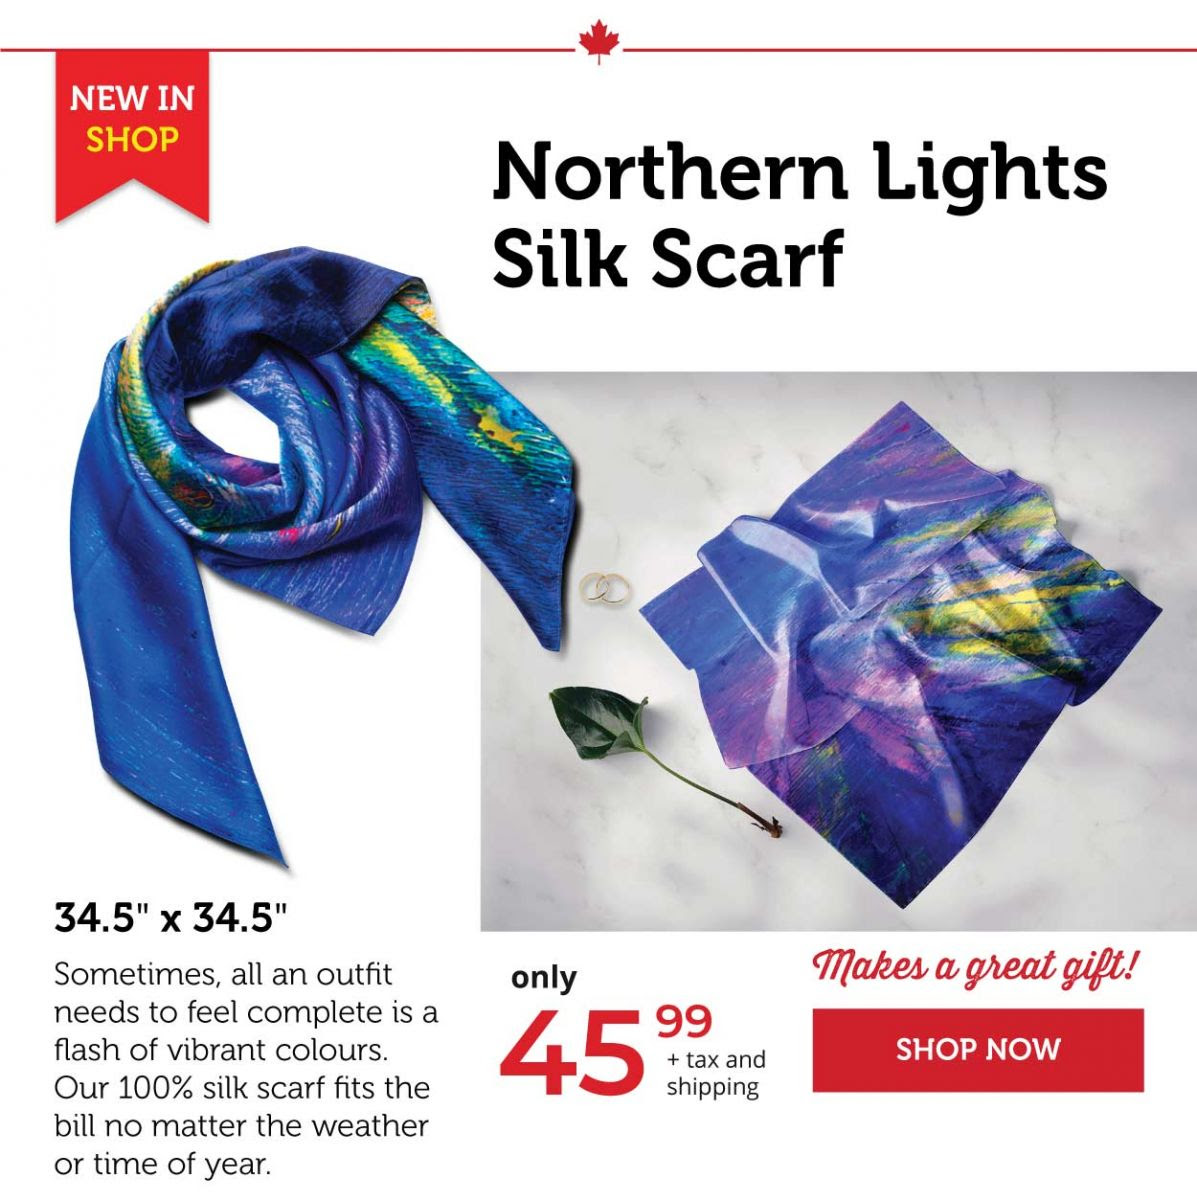 Northern lights silk scarf